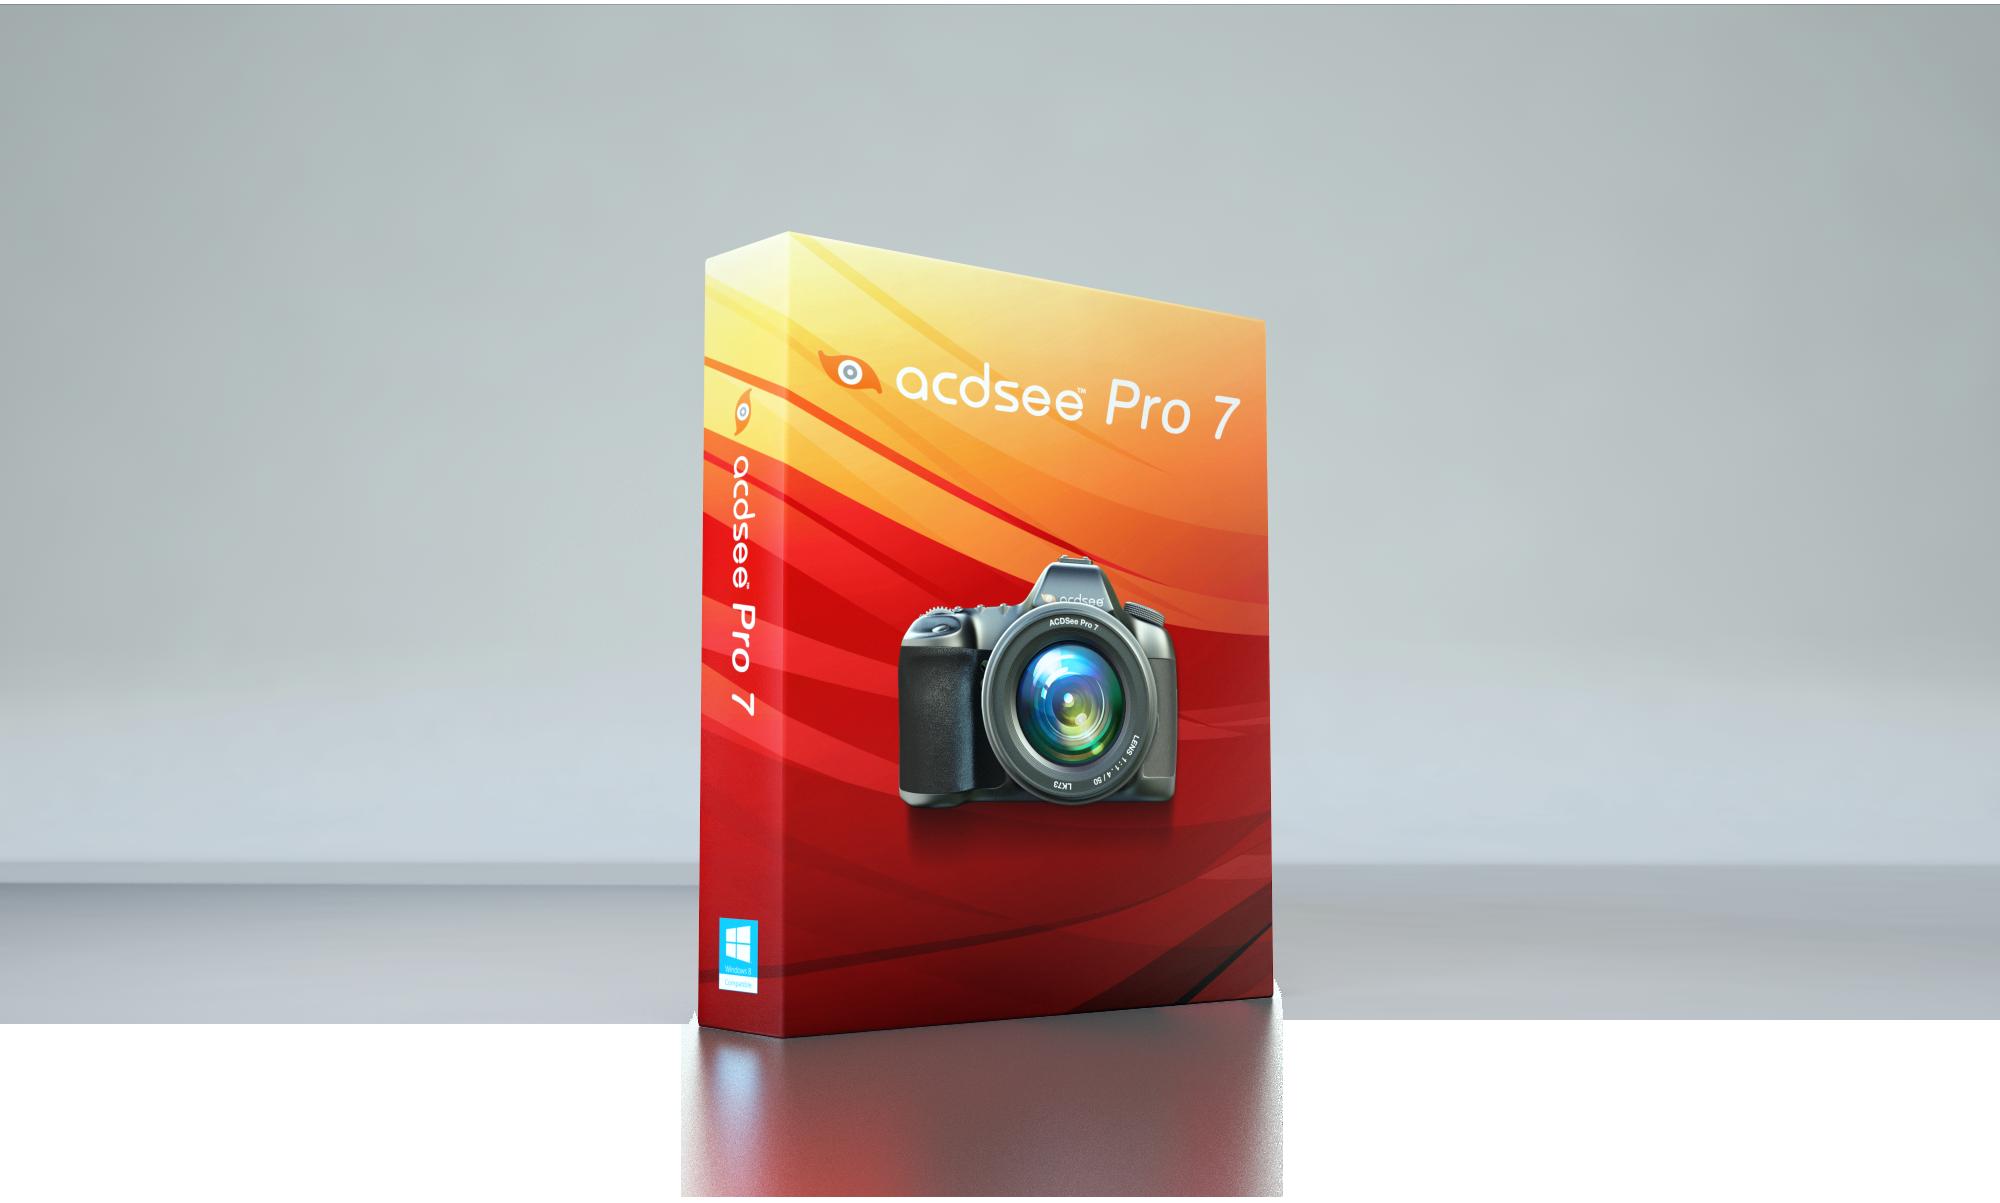 acdsee pro 7 32 bit license key